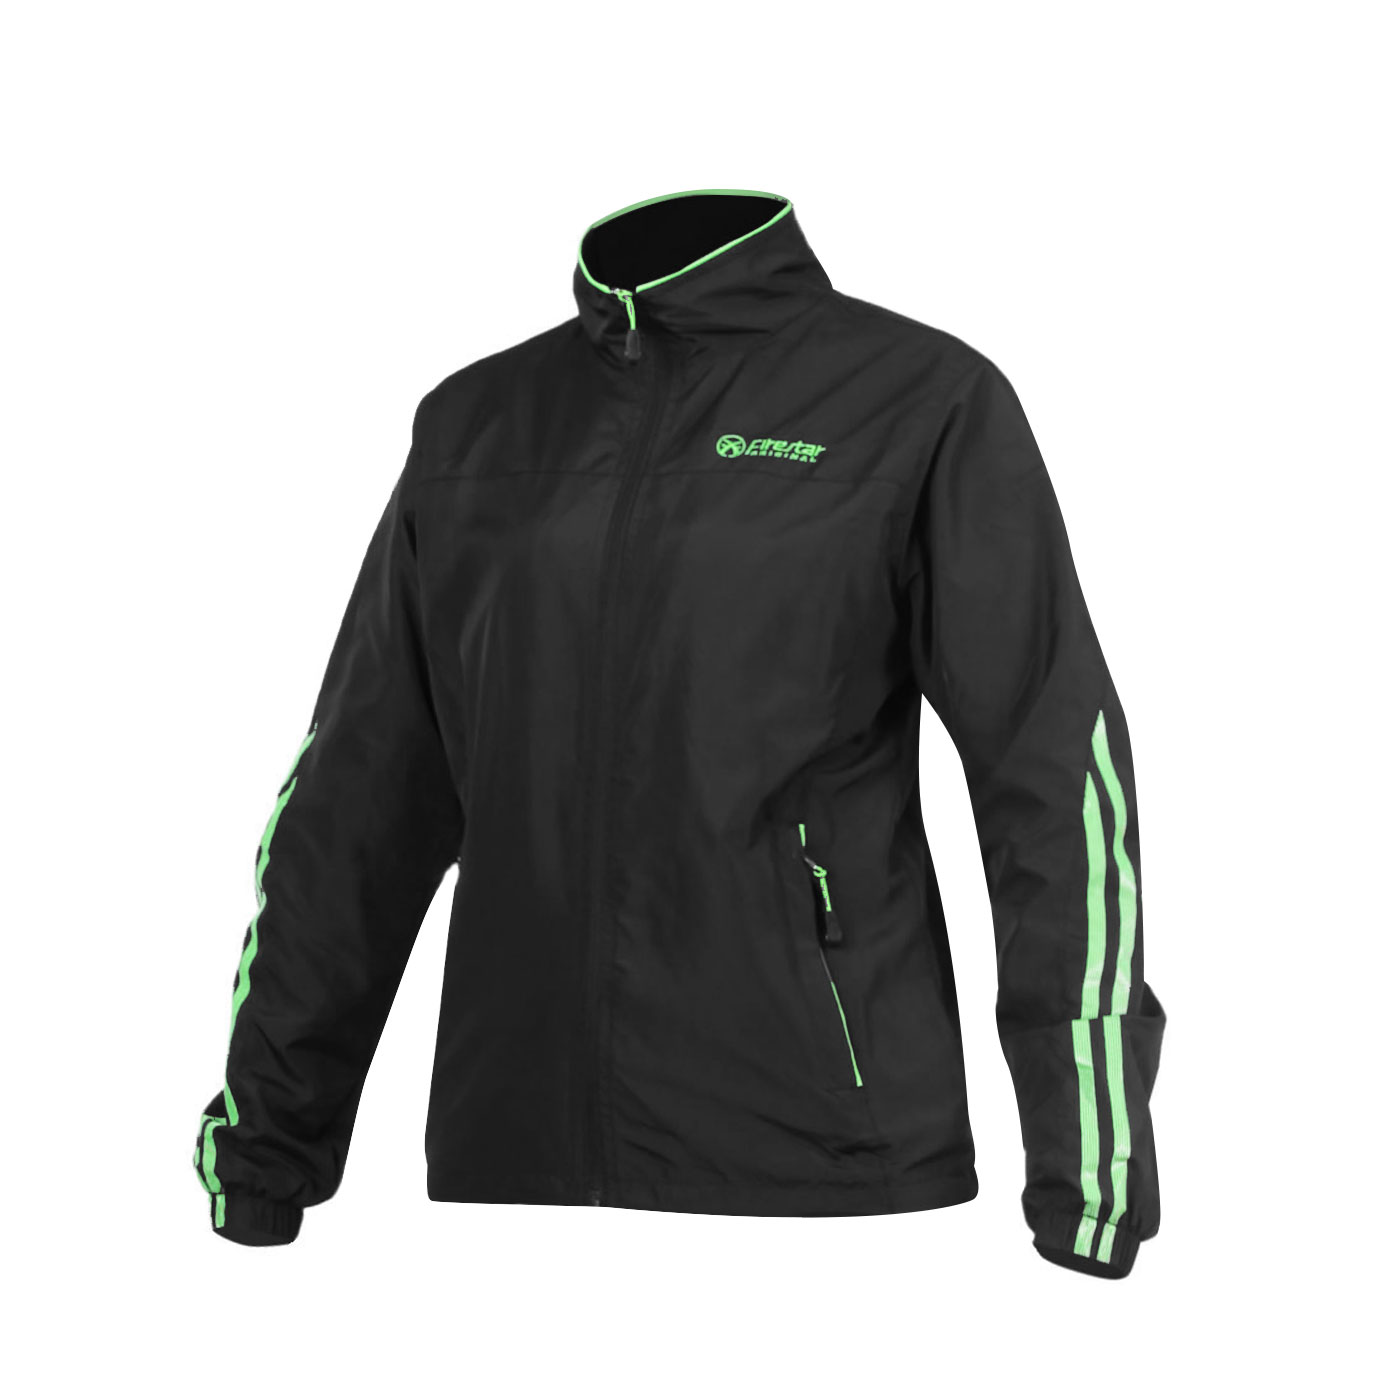 FIRESTAR 女款防水防風磨毛裏夾克 JL563-10 - 黑螢光綠